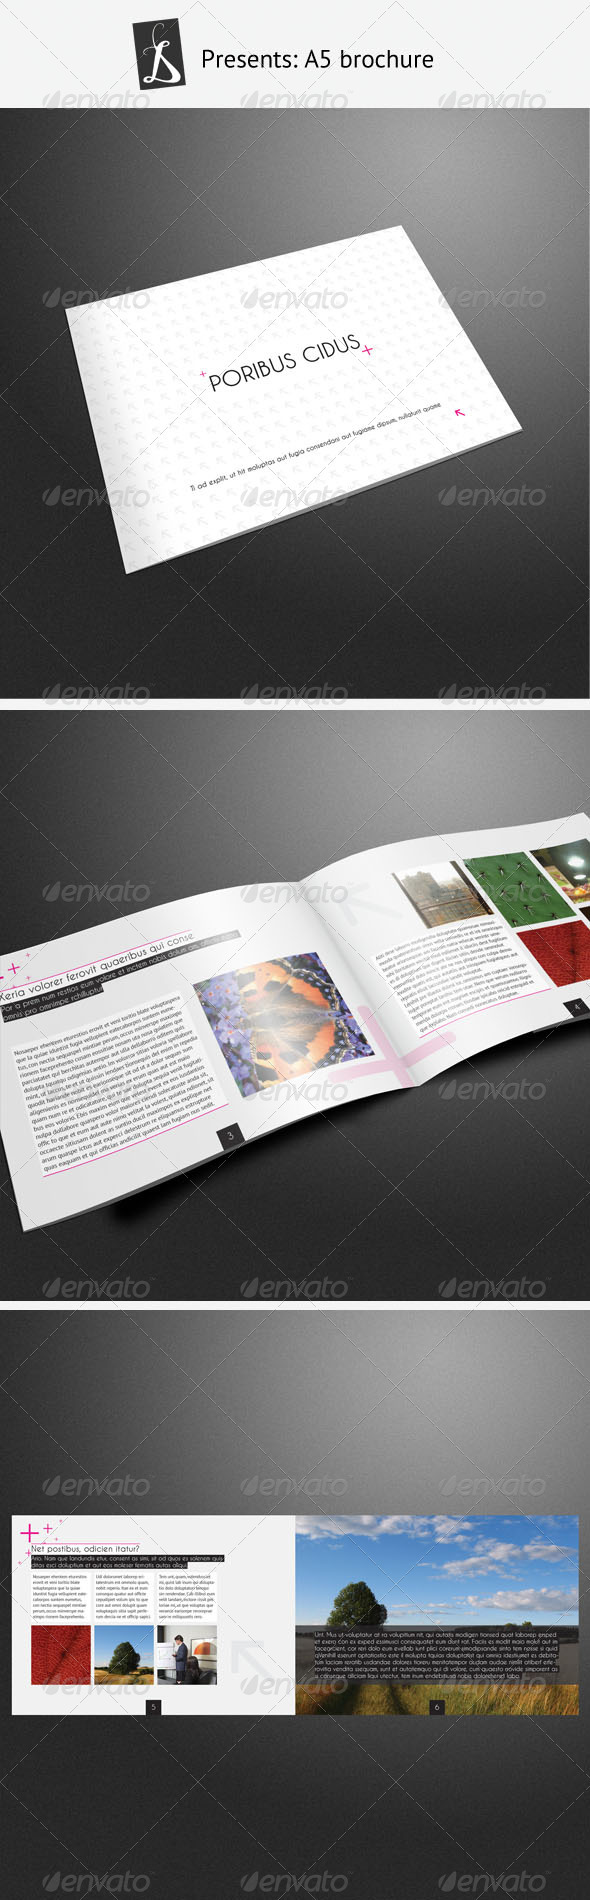 A5 Brochure 5 - Corporate Brochures